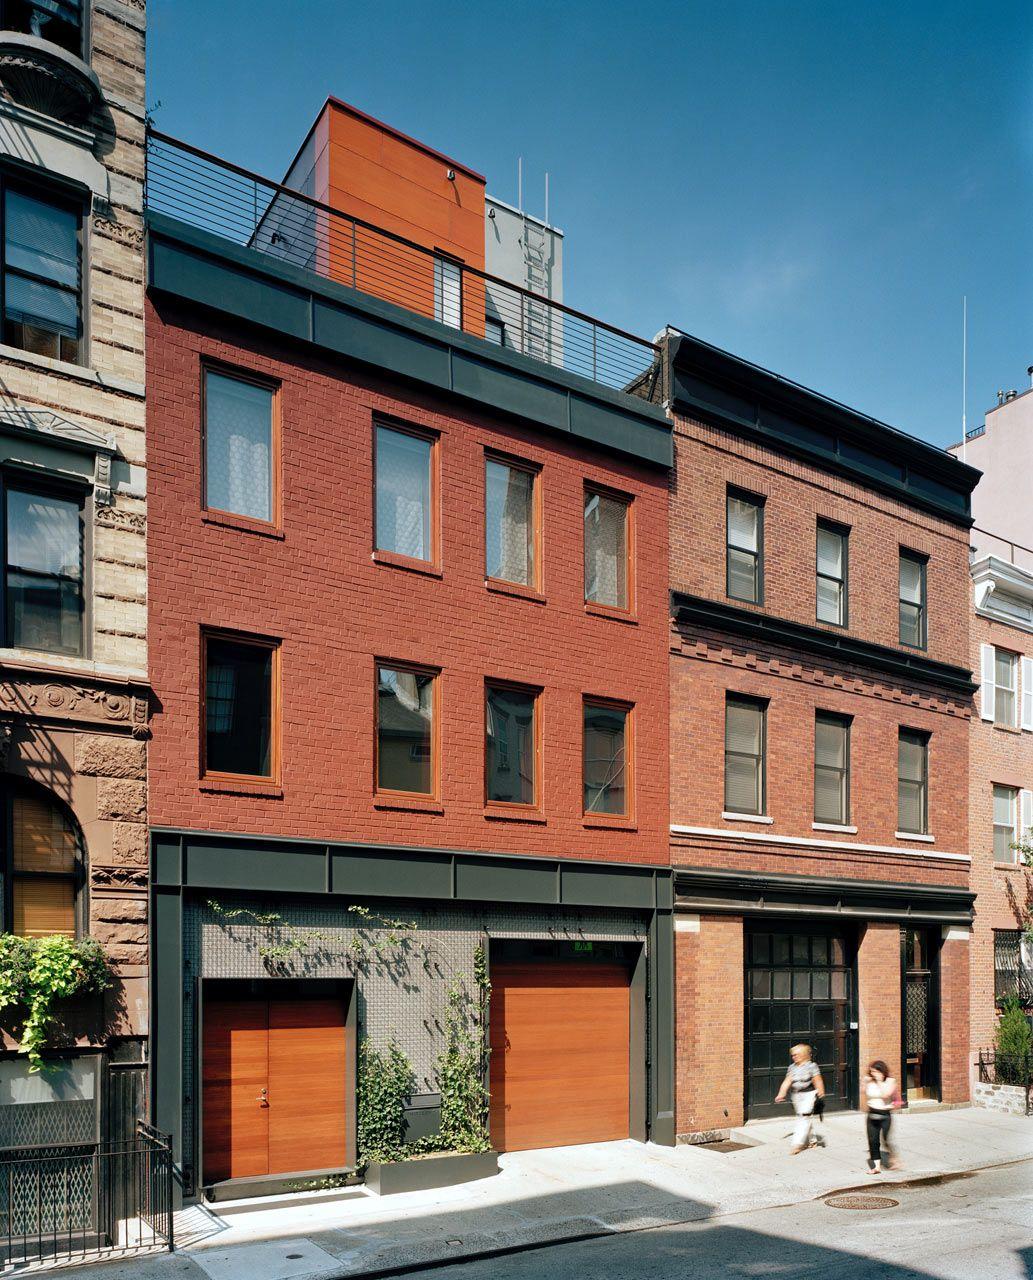 leroy street townhouse turett collaborative architects 1